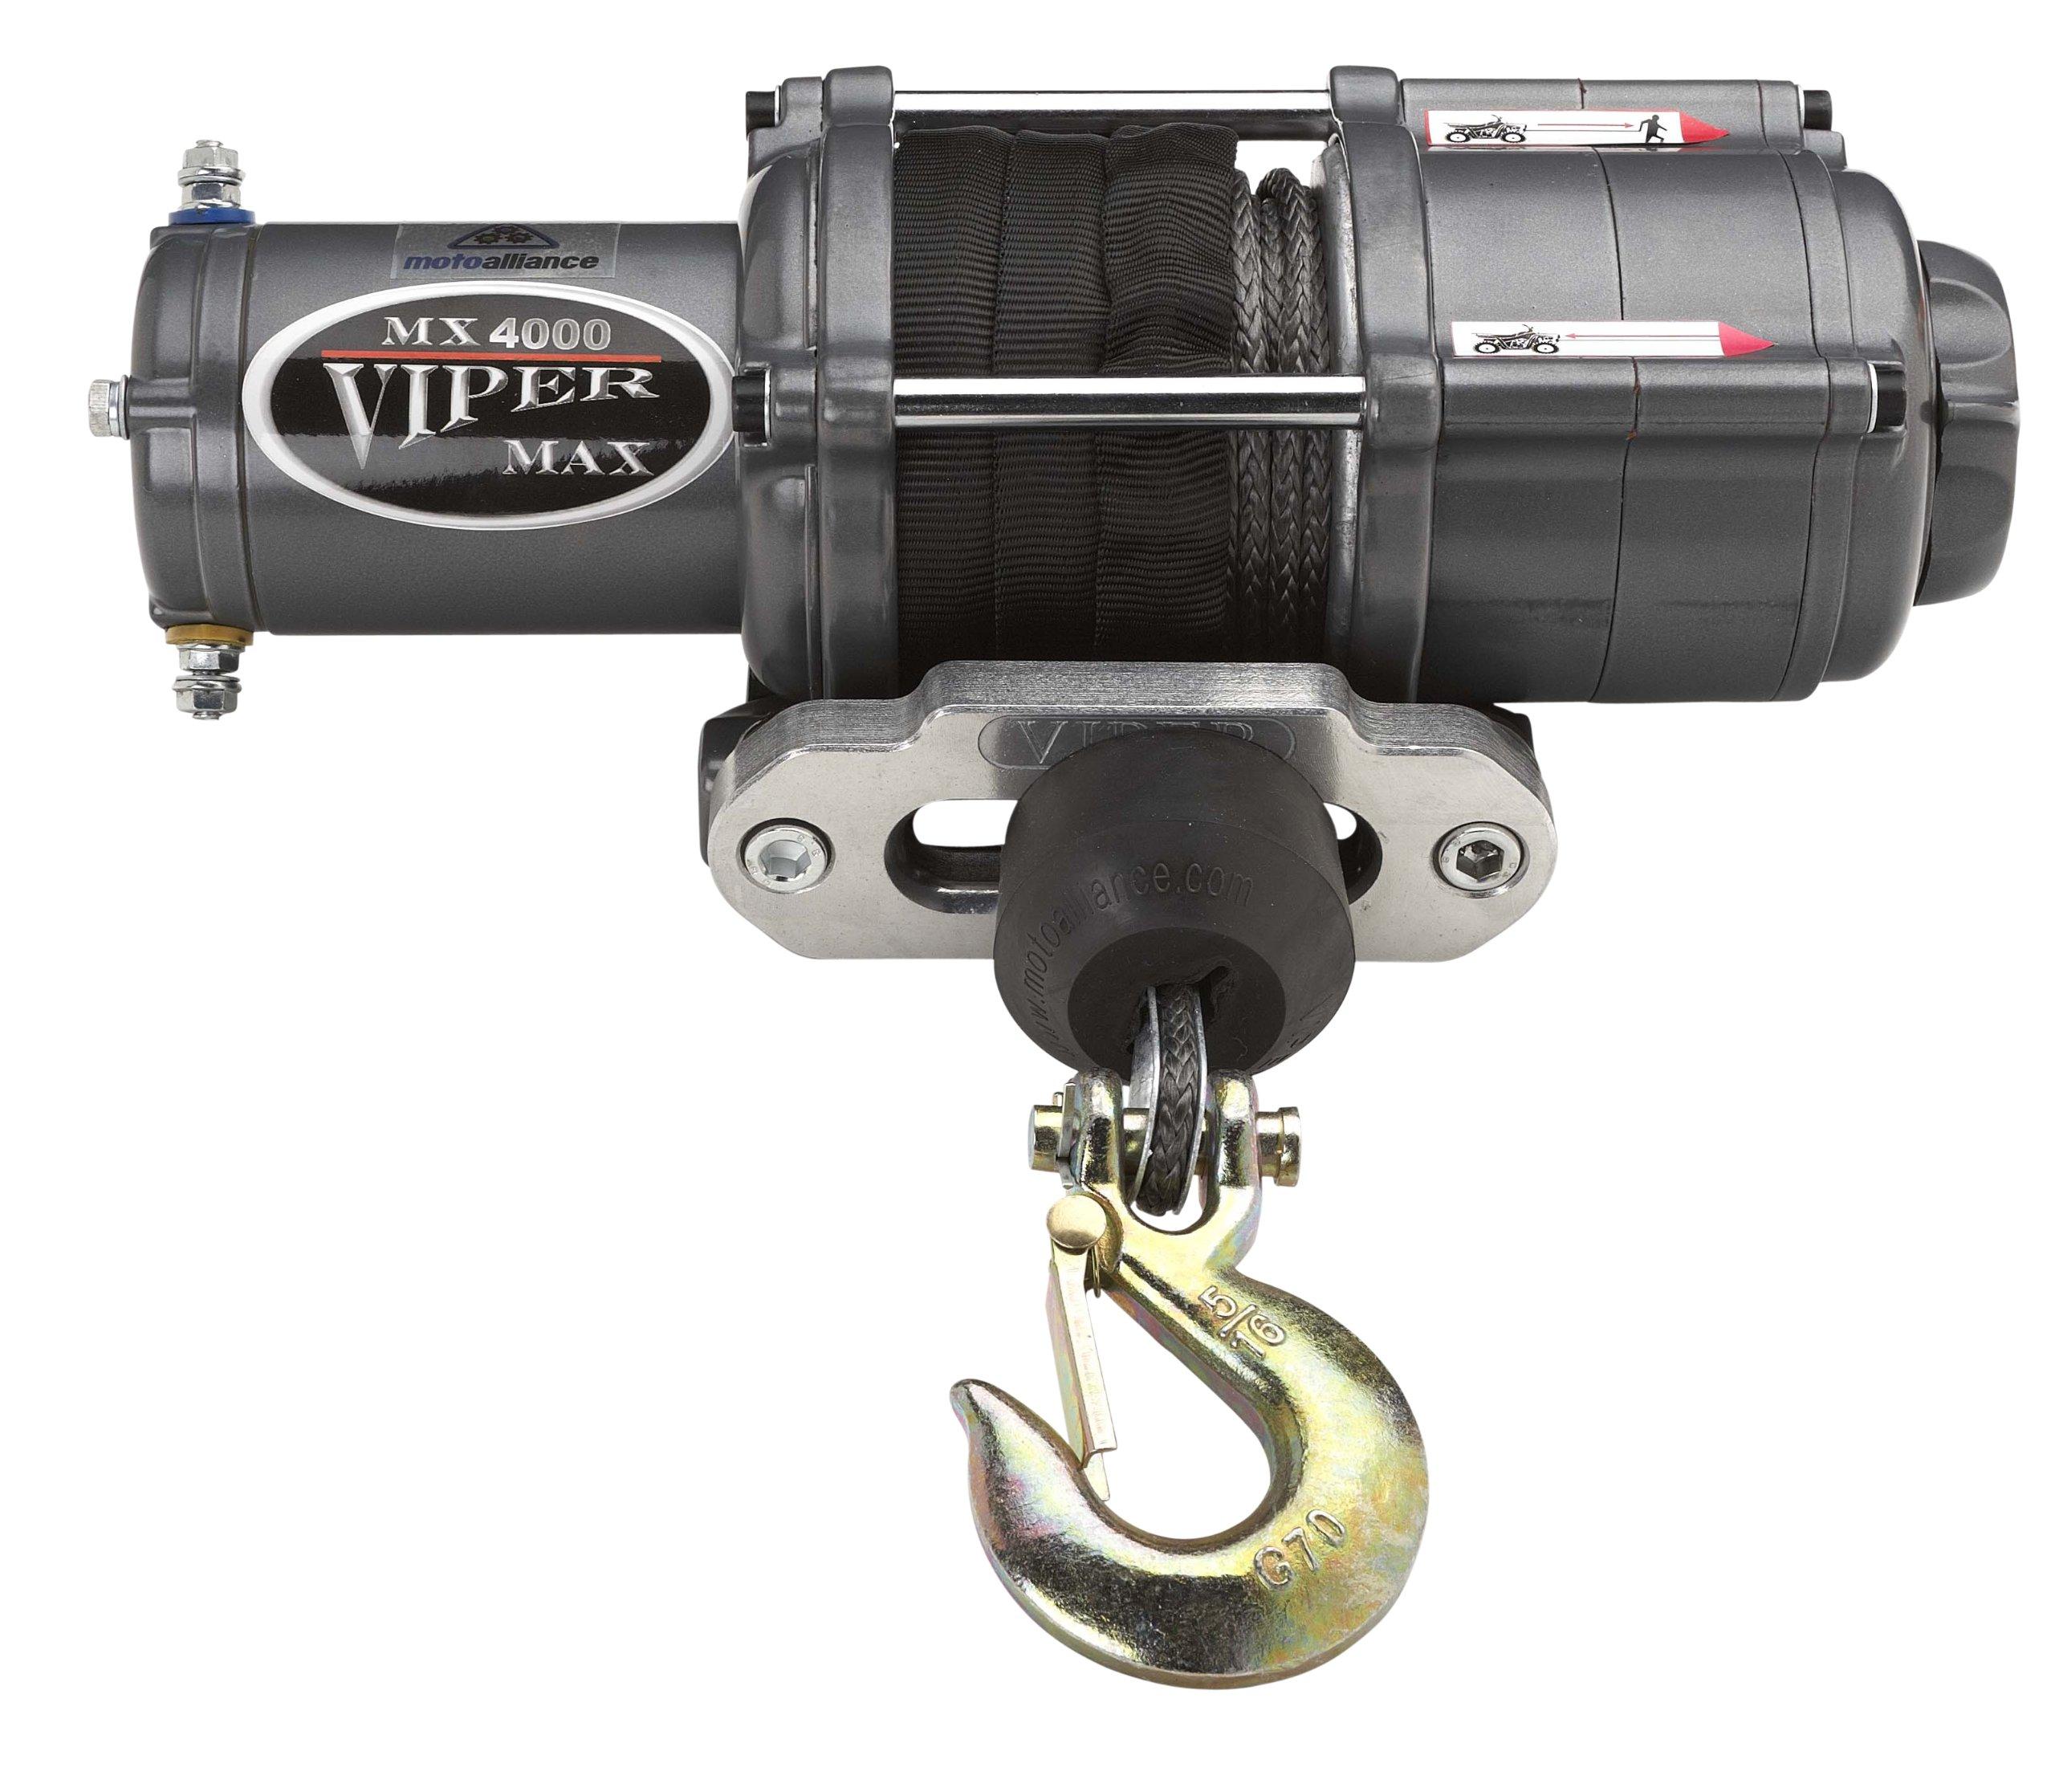 VIPER Max 4000lb ATV/UTV Winch Kit with 50 feet BLACK Synthetic Rope